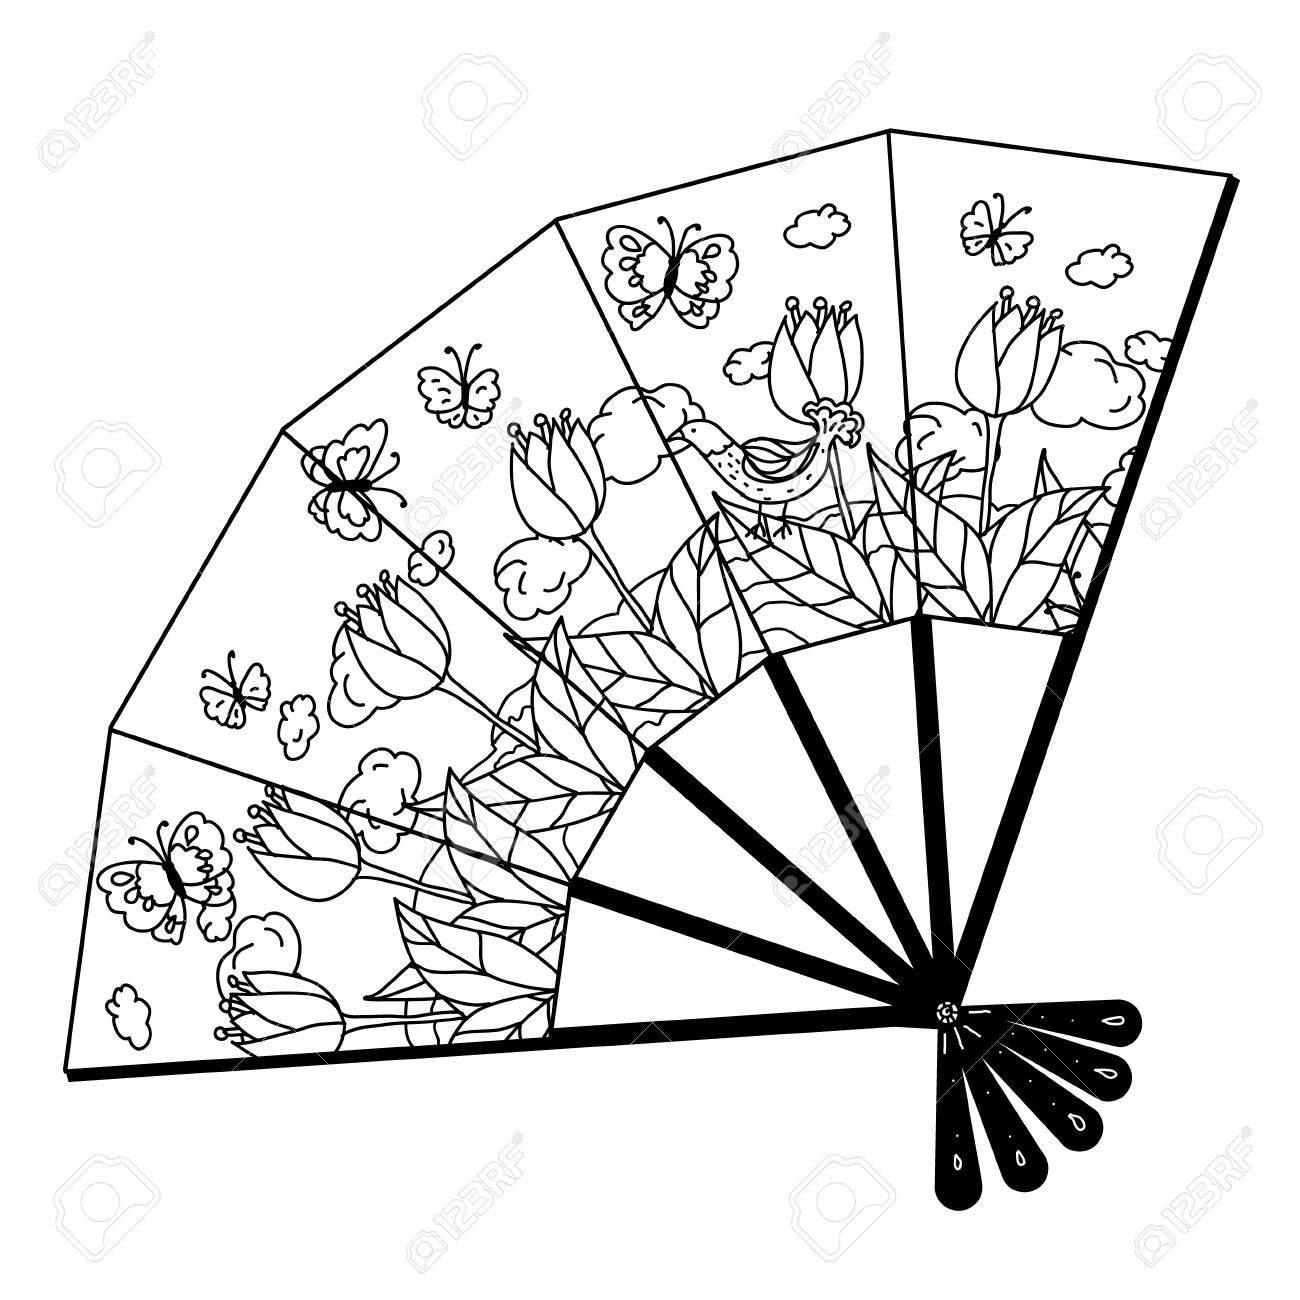 Oriental fan decorated with floral patterns interpretation. Black...